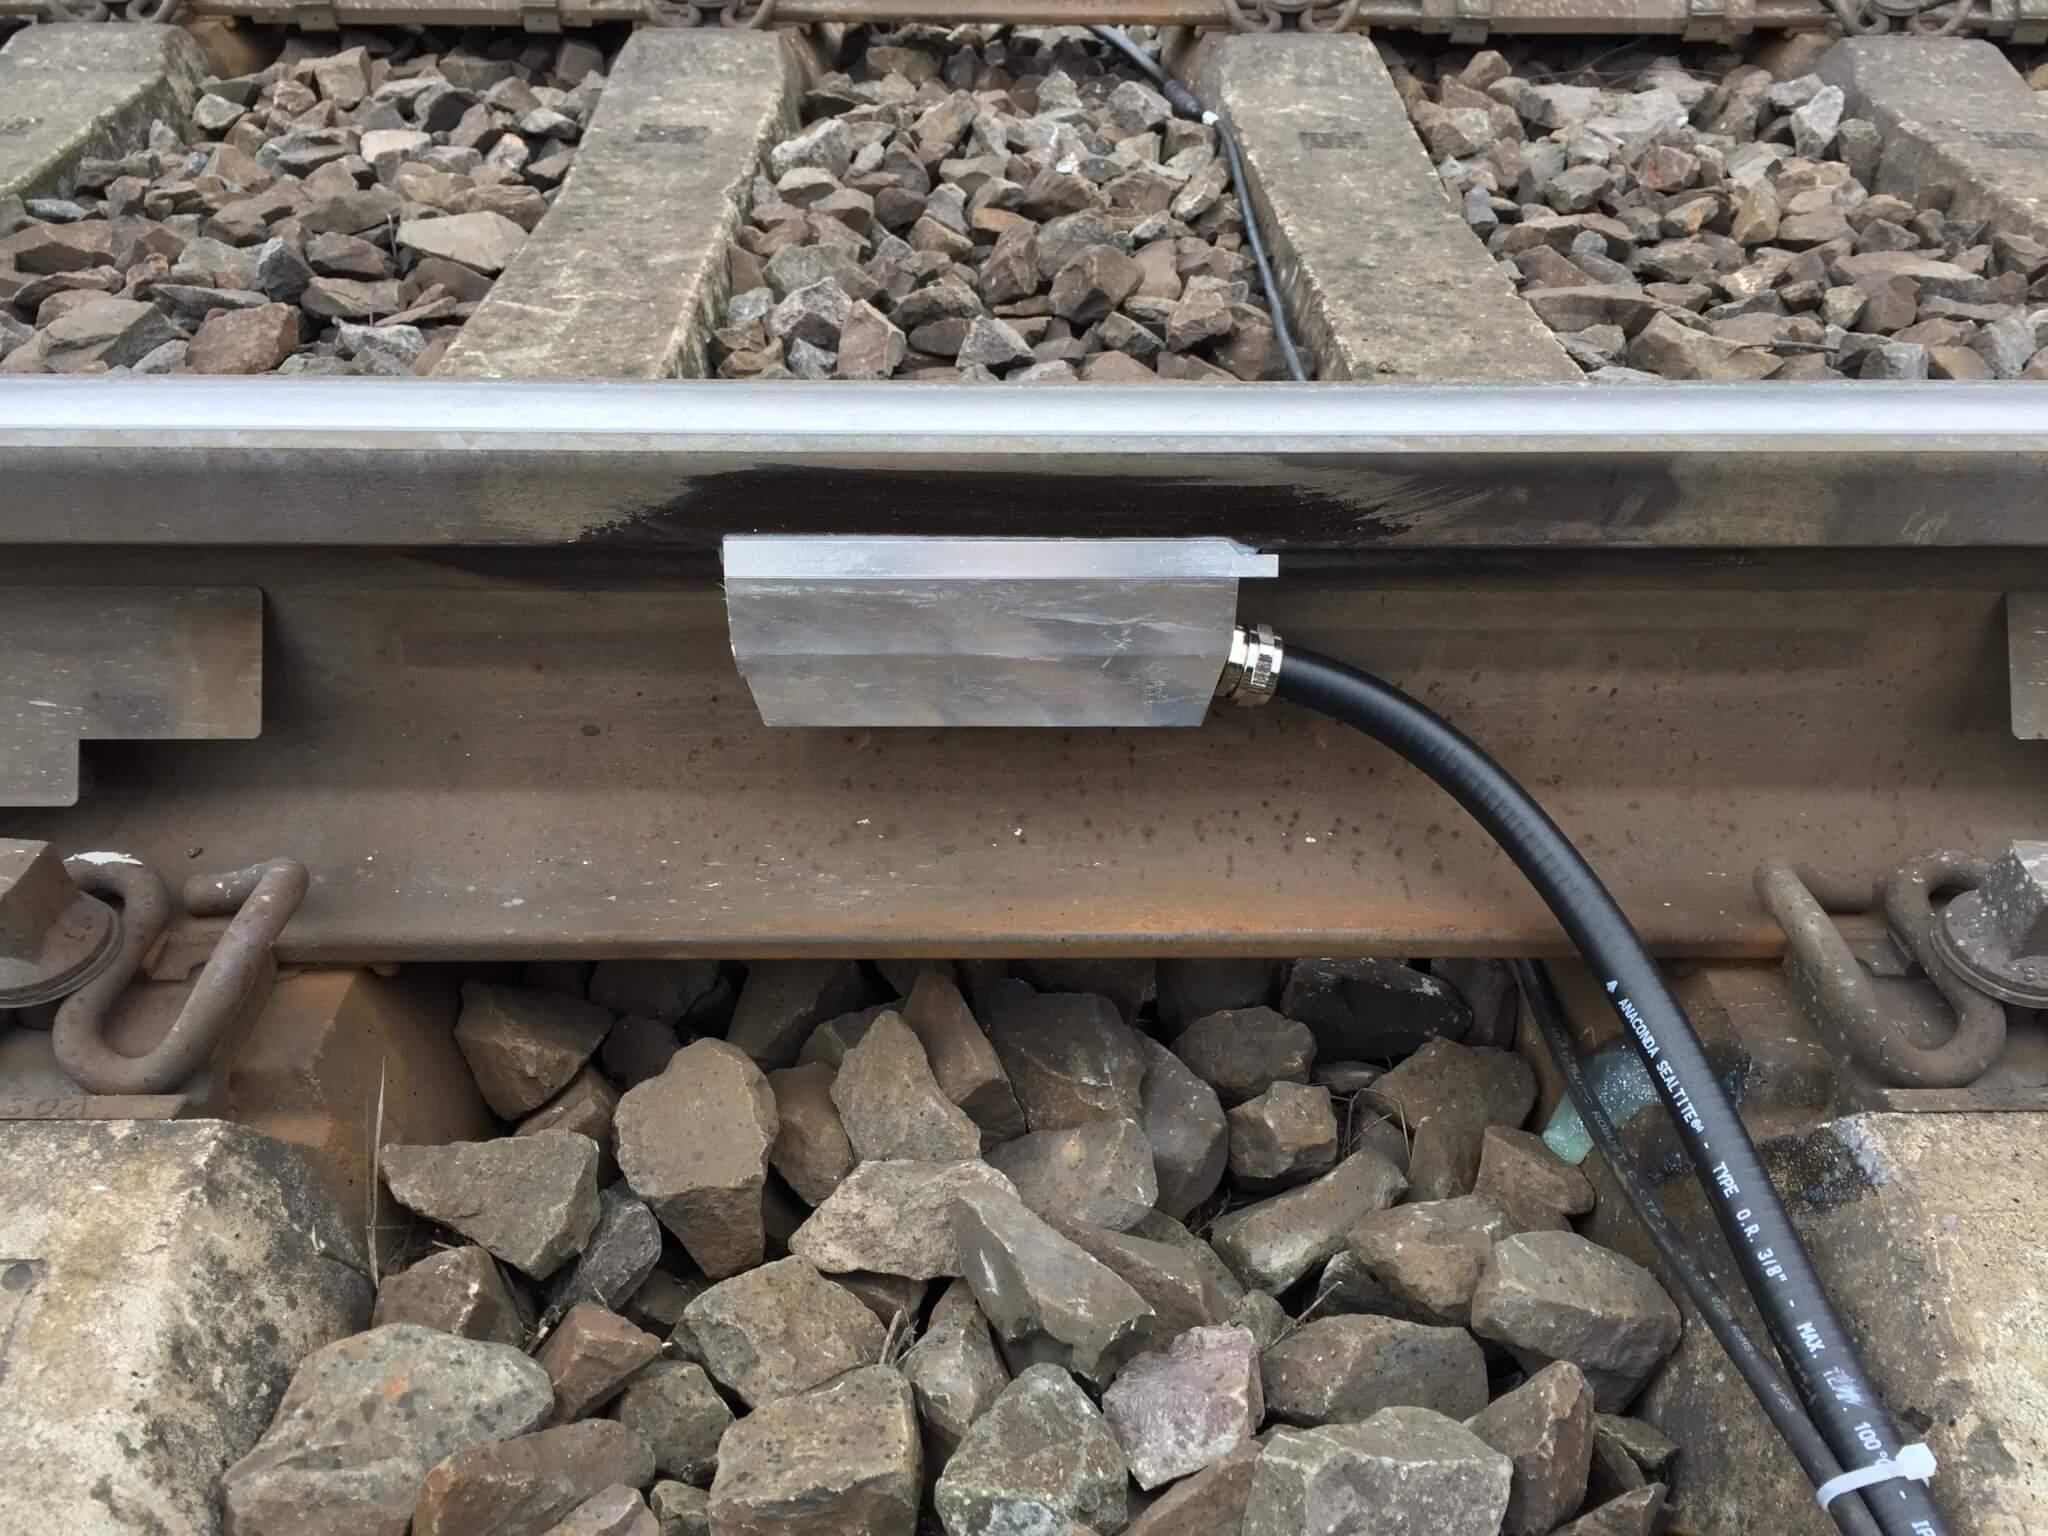 Vibration Detection Unit (VDU) installed on the rail